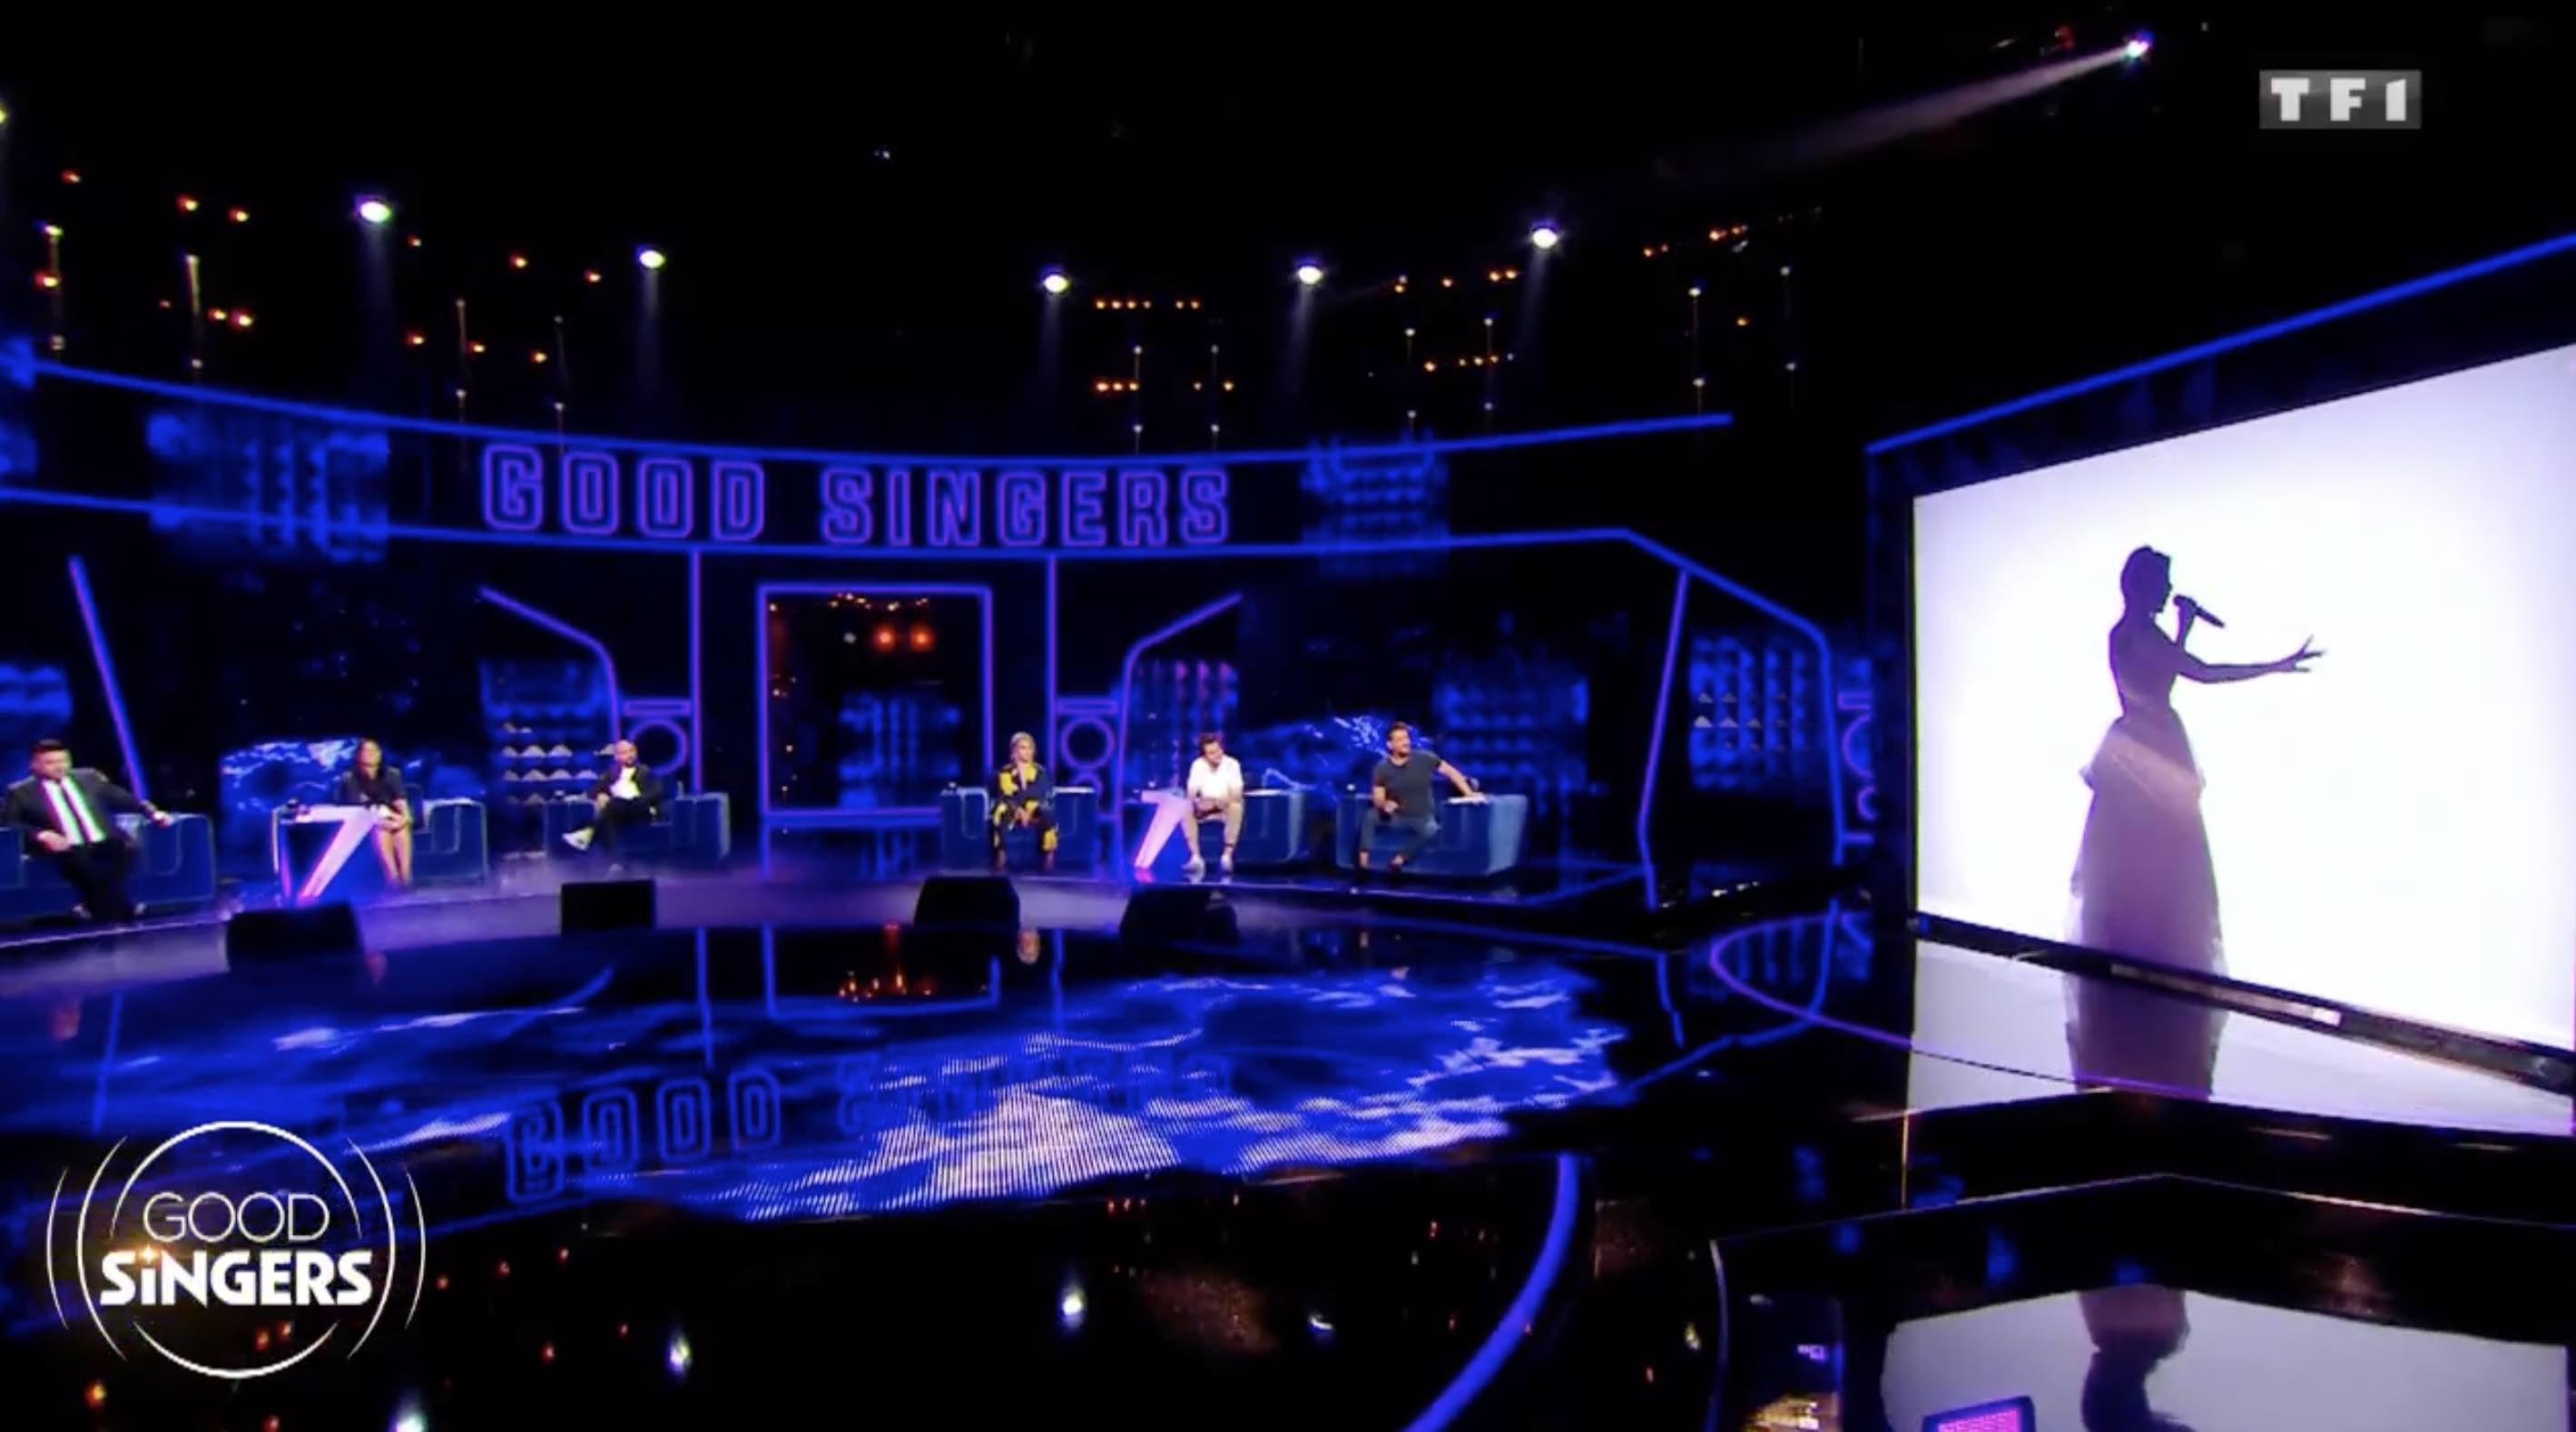 Good singers - TF1 - Jarry